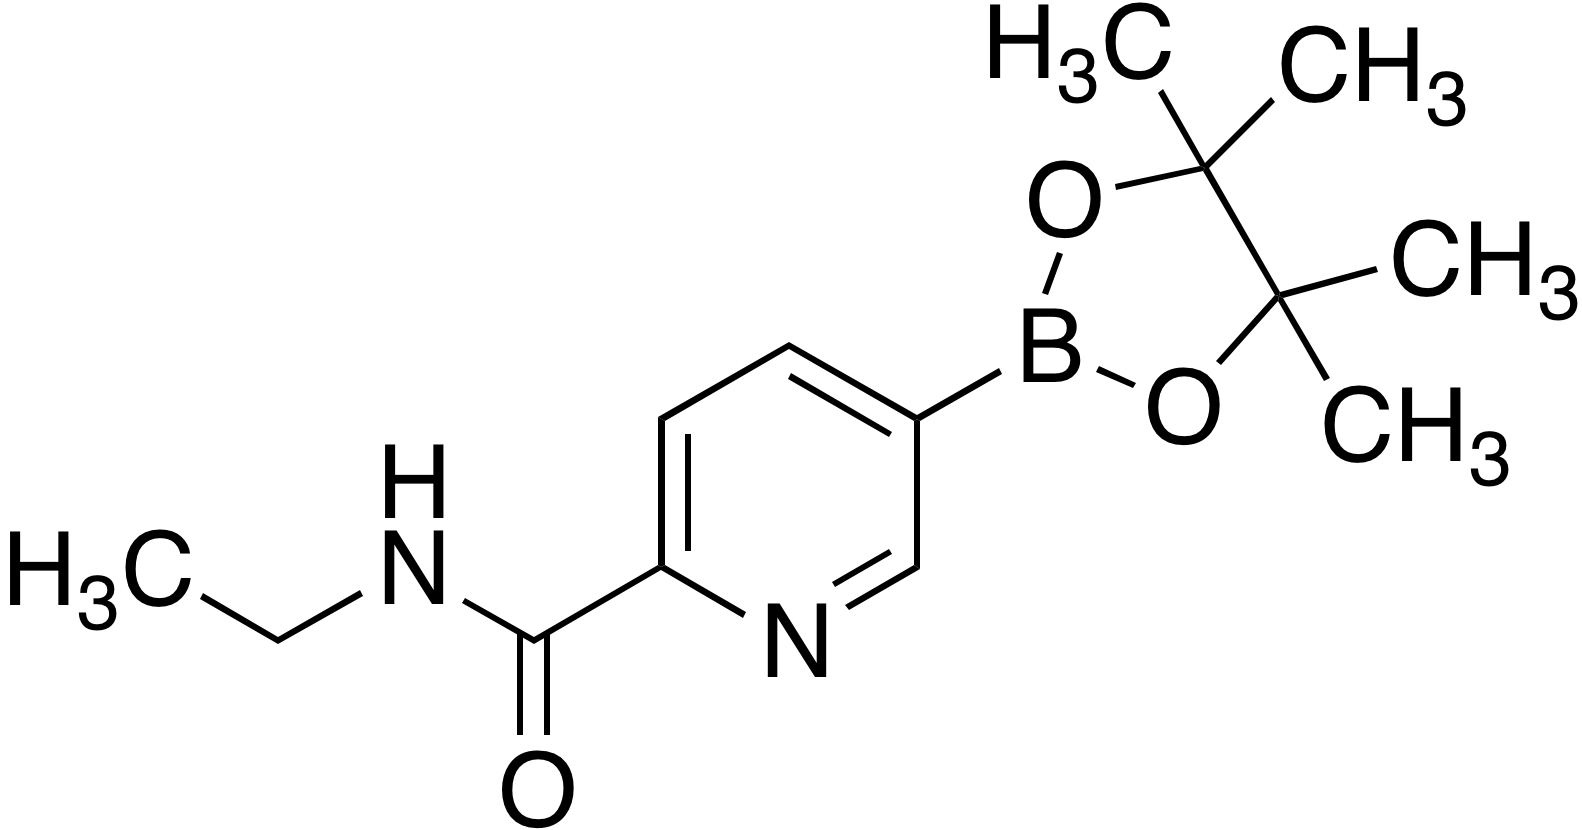 2-(Ethylaminocarbonyl)pyridine-5-boronic acid pinacol ester